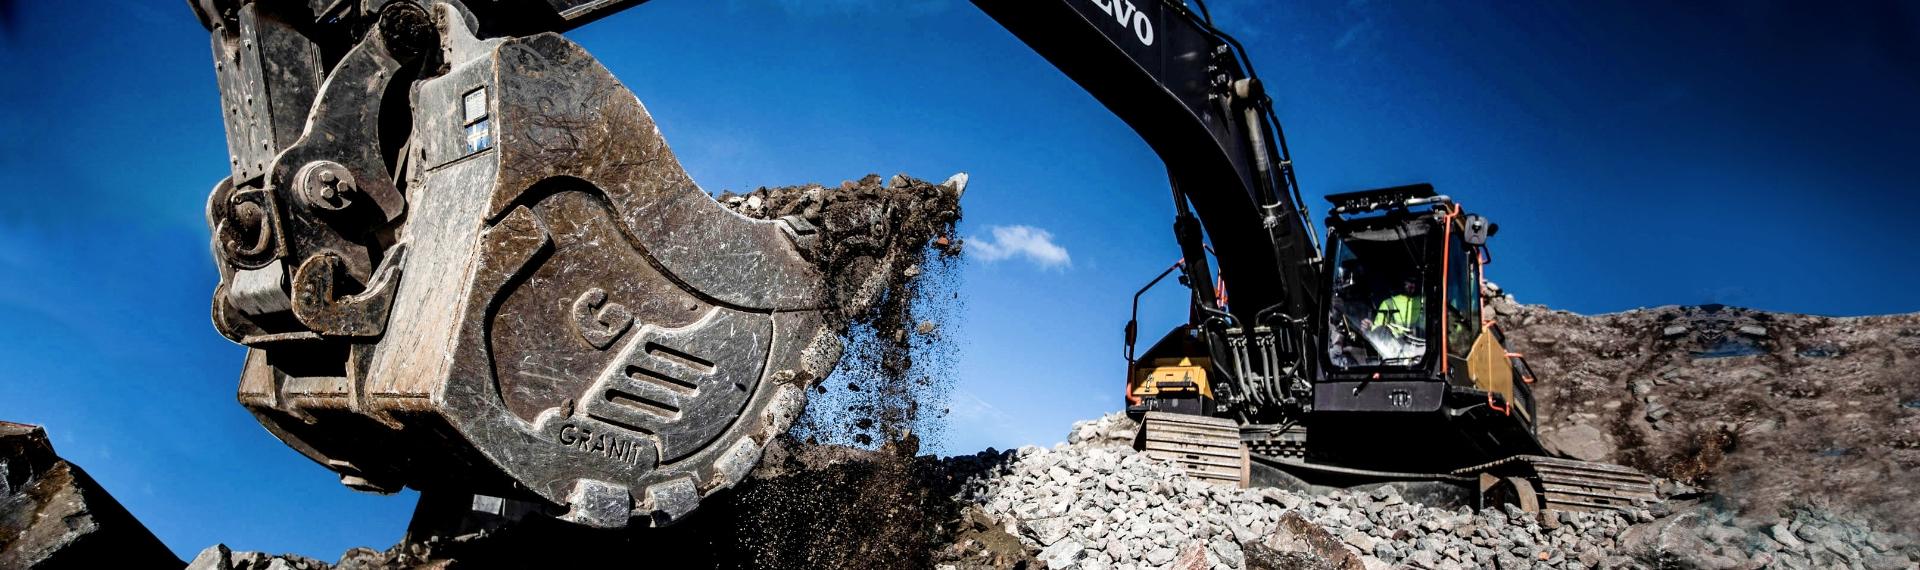 A severe duty bucket for excavators built in Hardox® 500 Tuf steel.